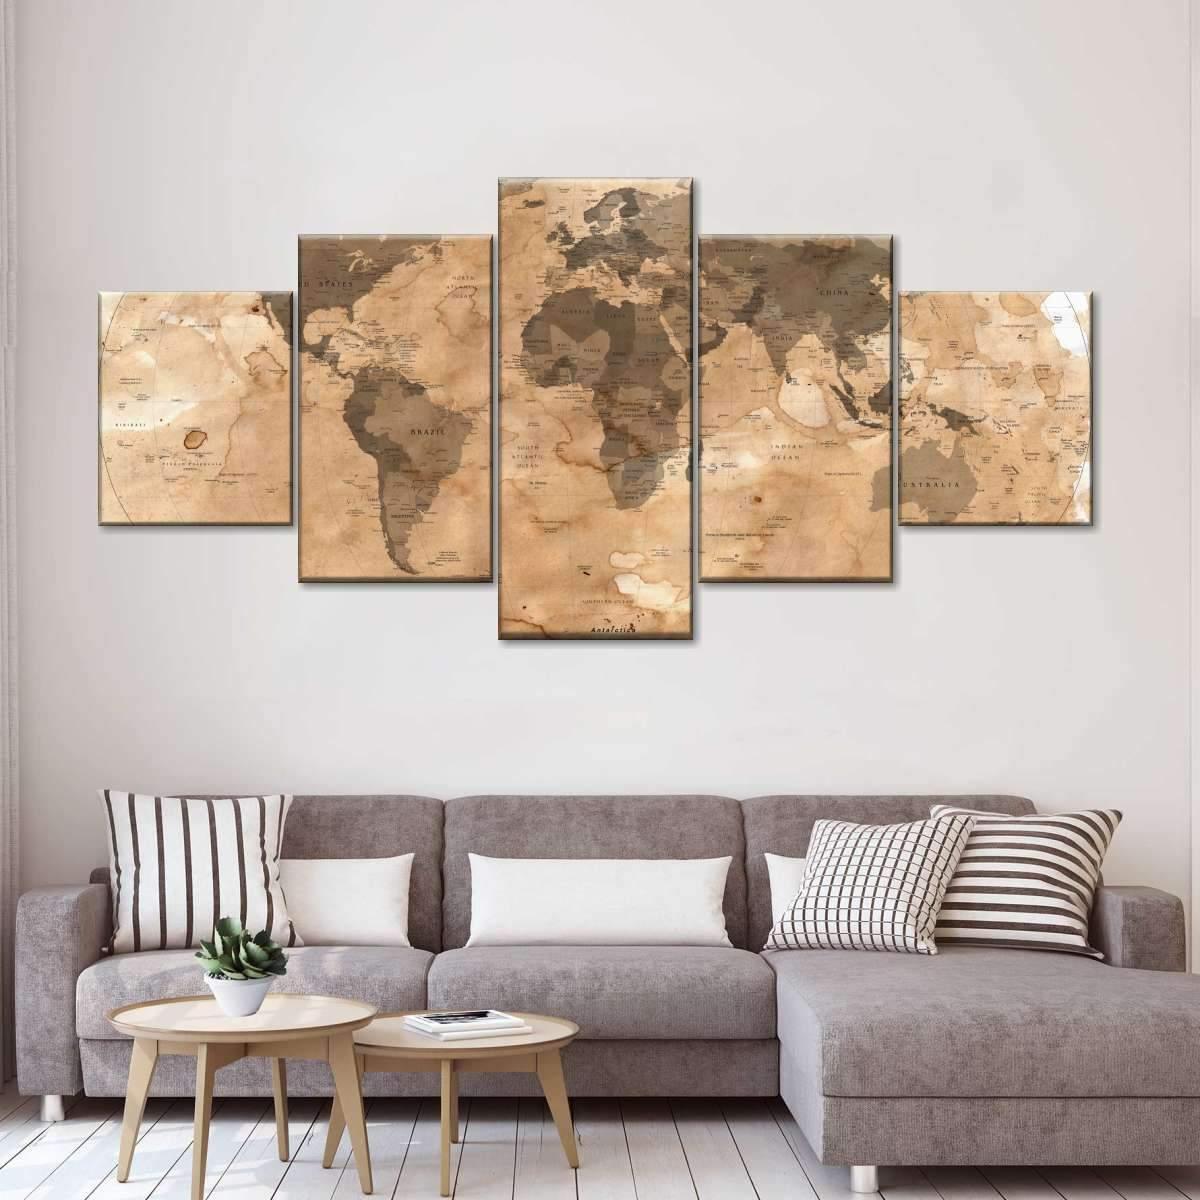 Dirty World Map Multi Panel Canvas Wall Art